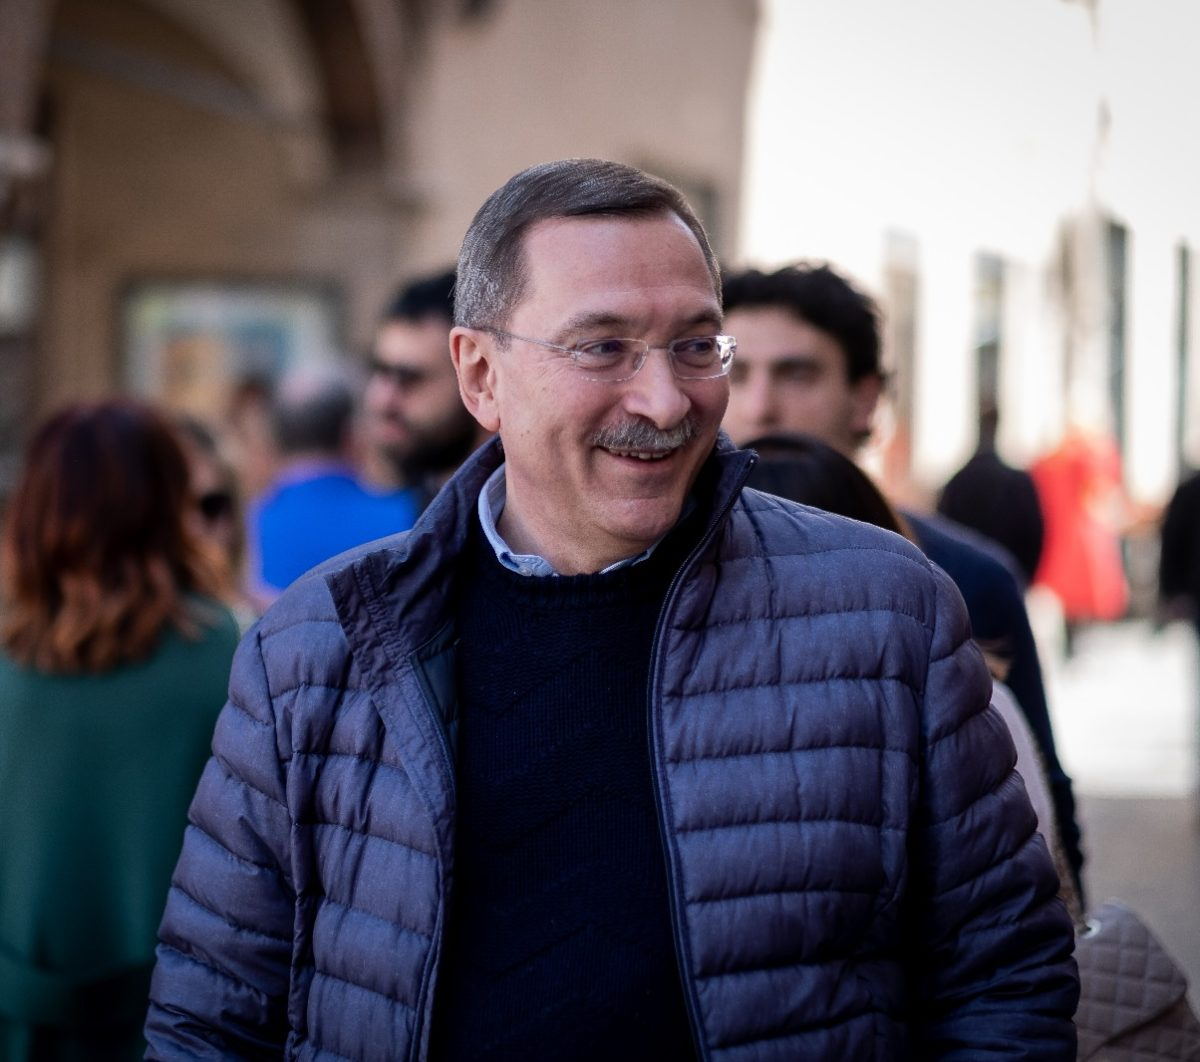 Pietro Frenquellucci